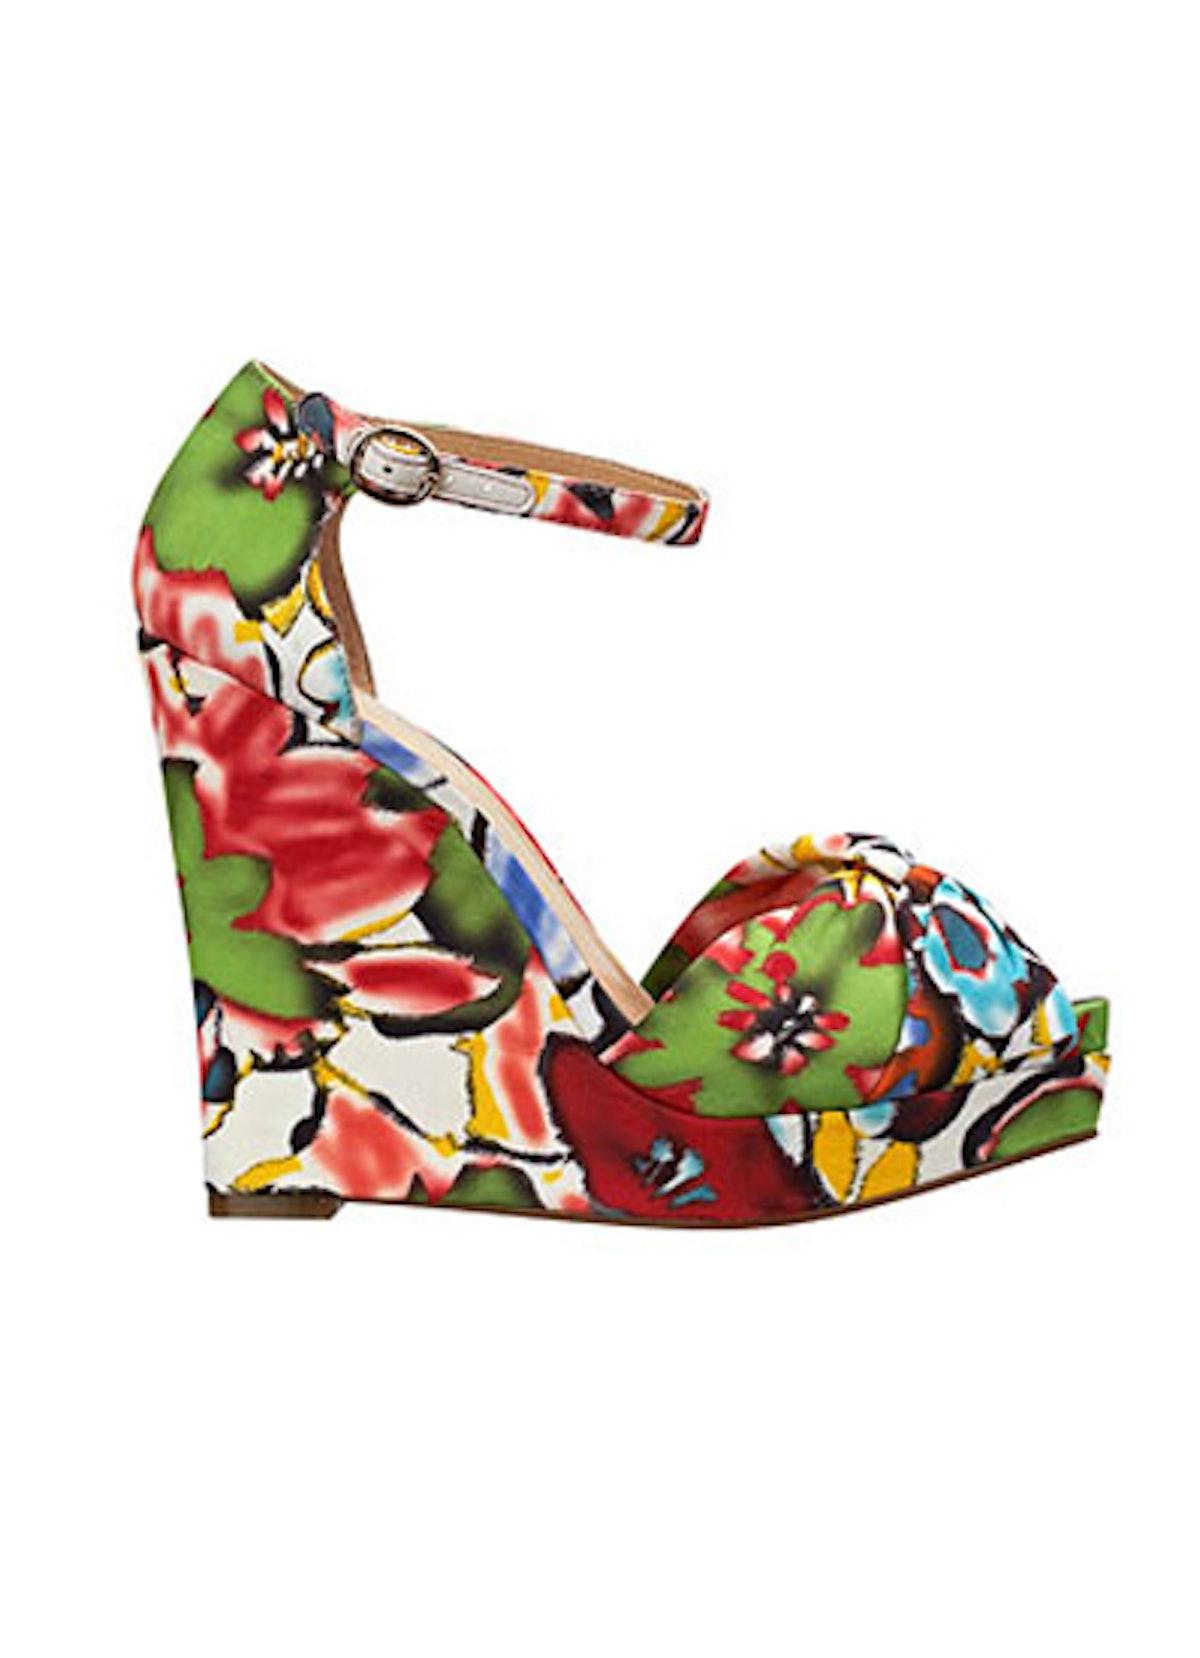 acss-floral-pieces-06-v.jpg